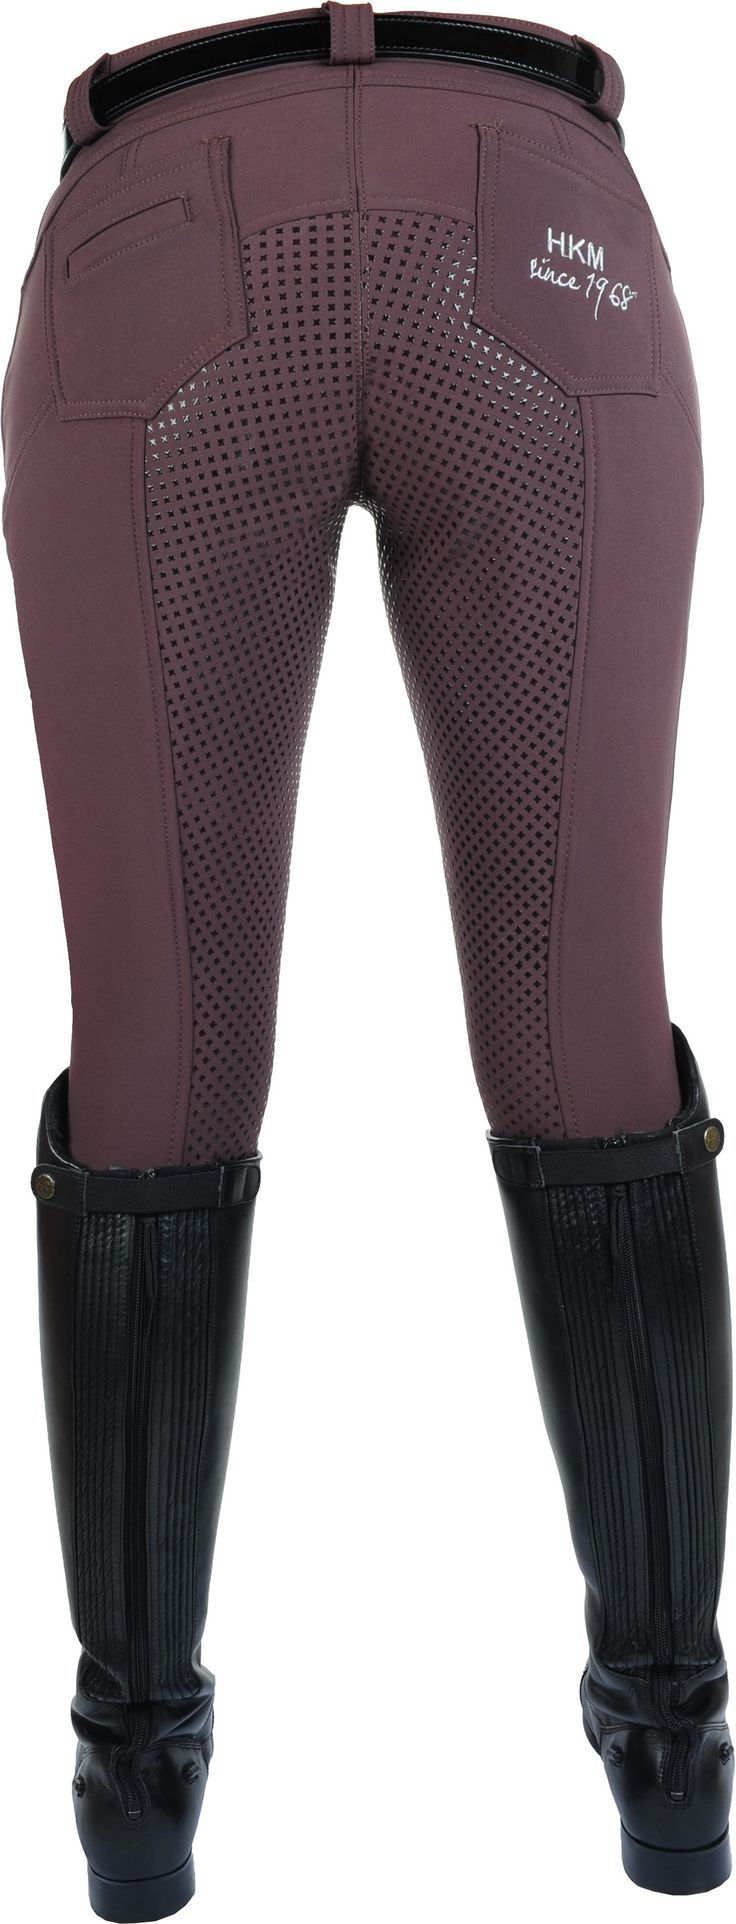 Trend Alert: Breeches With Patterned Full Seat | Velvet Rider #equestrianstyle #equestrianfashion #equestriantrend